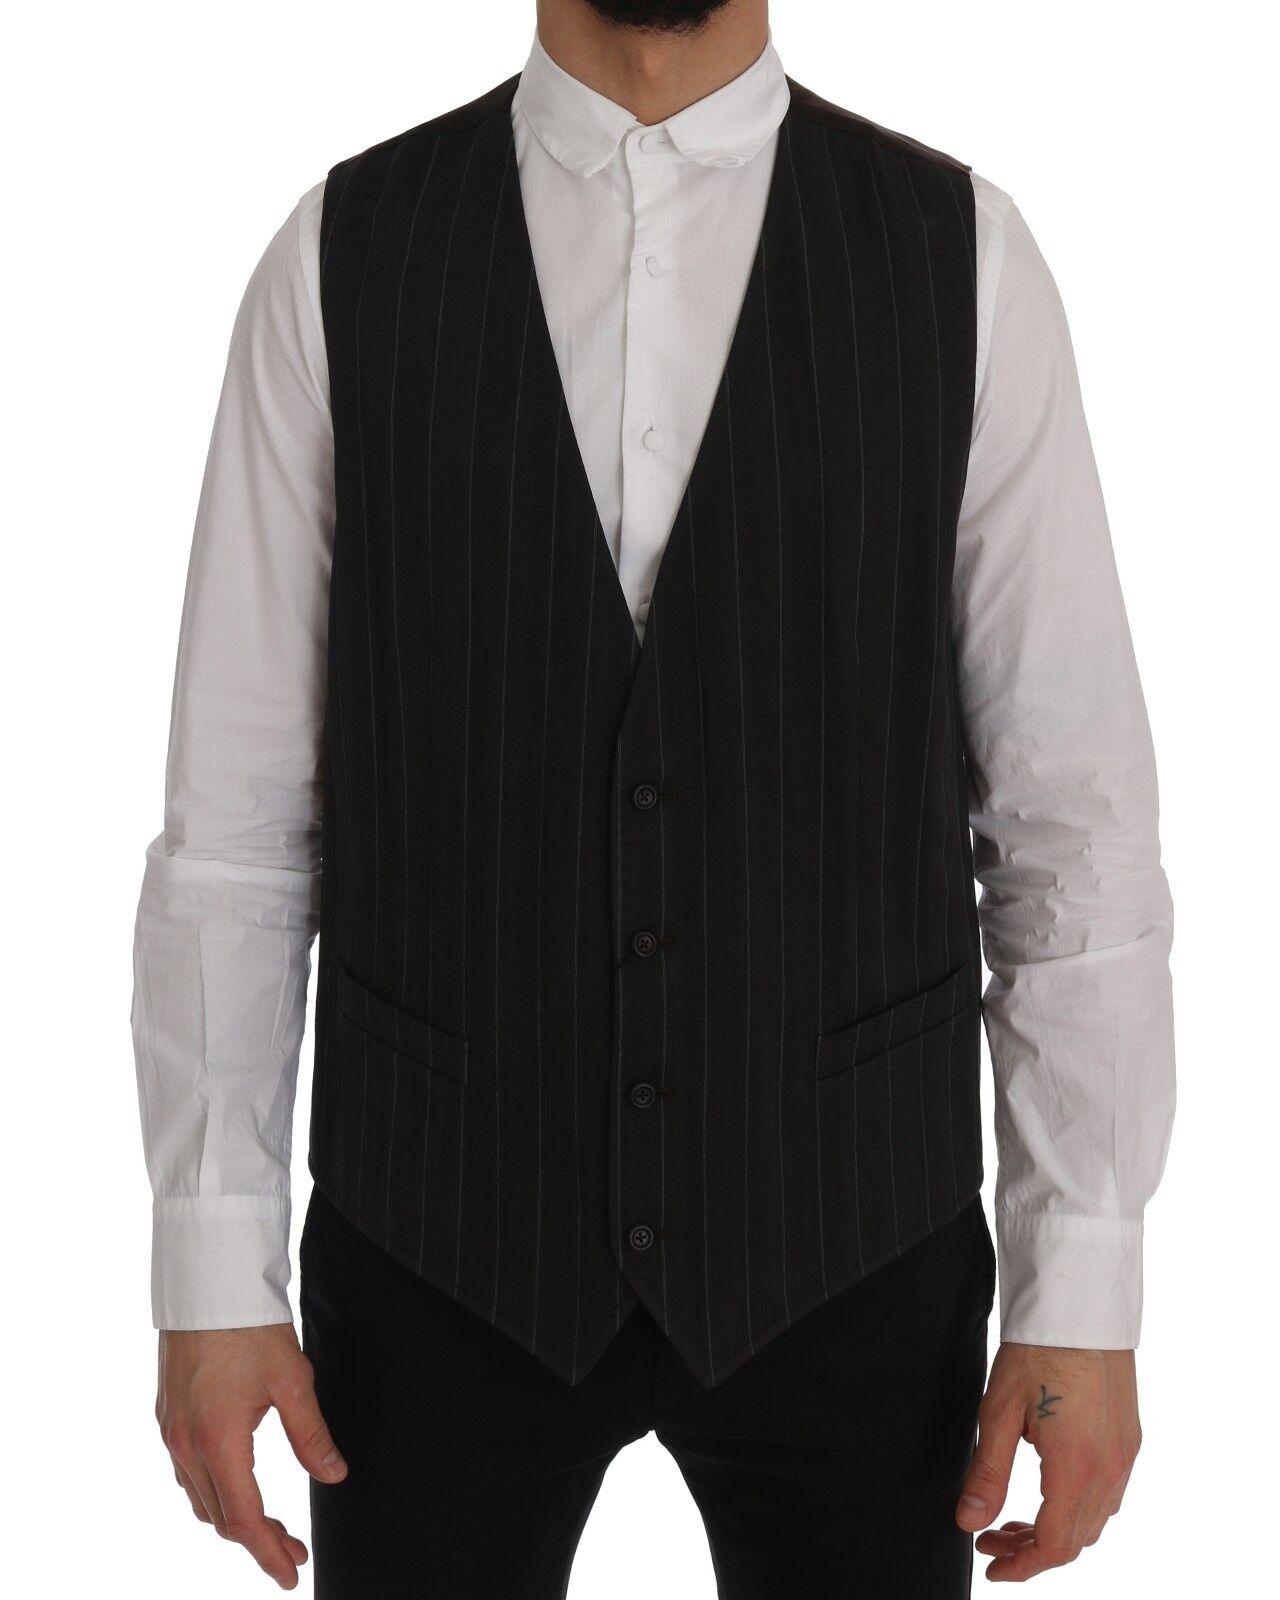 NEW DOLCE & GABBANA STAFF Vest Waistcoat grau Cotton Striped IT54/US44/2XL